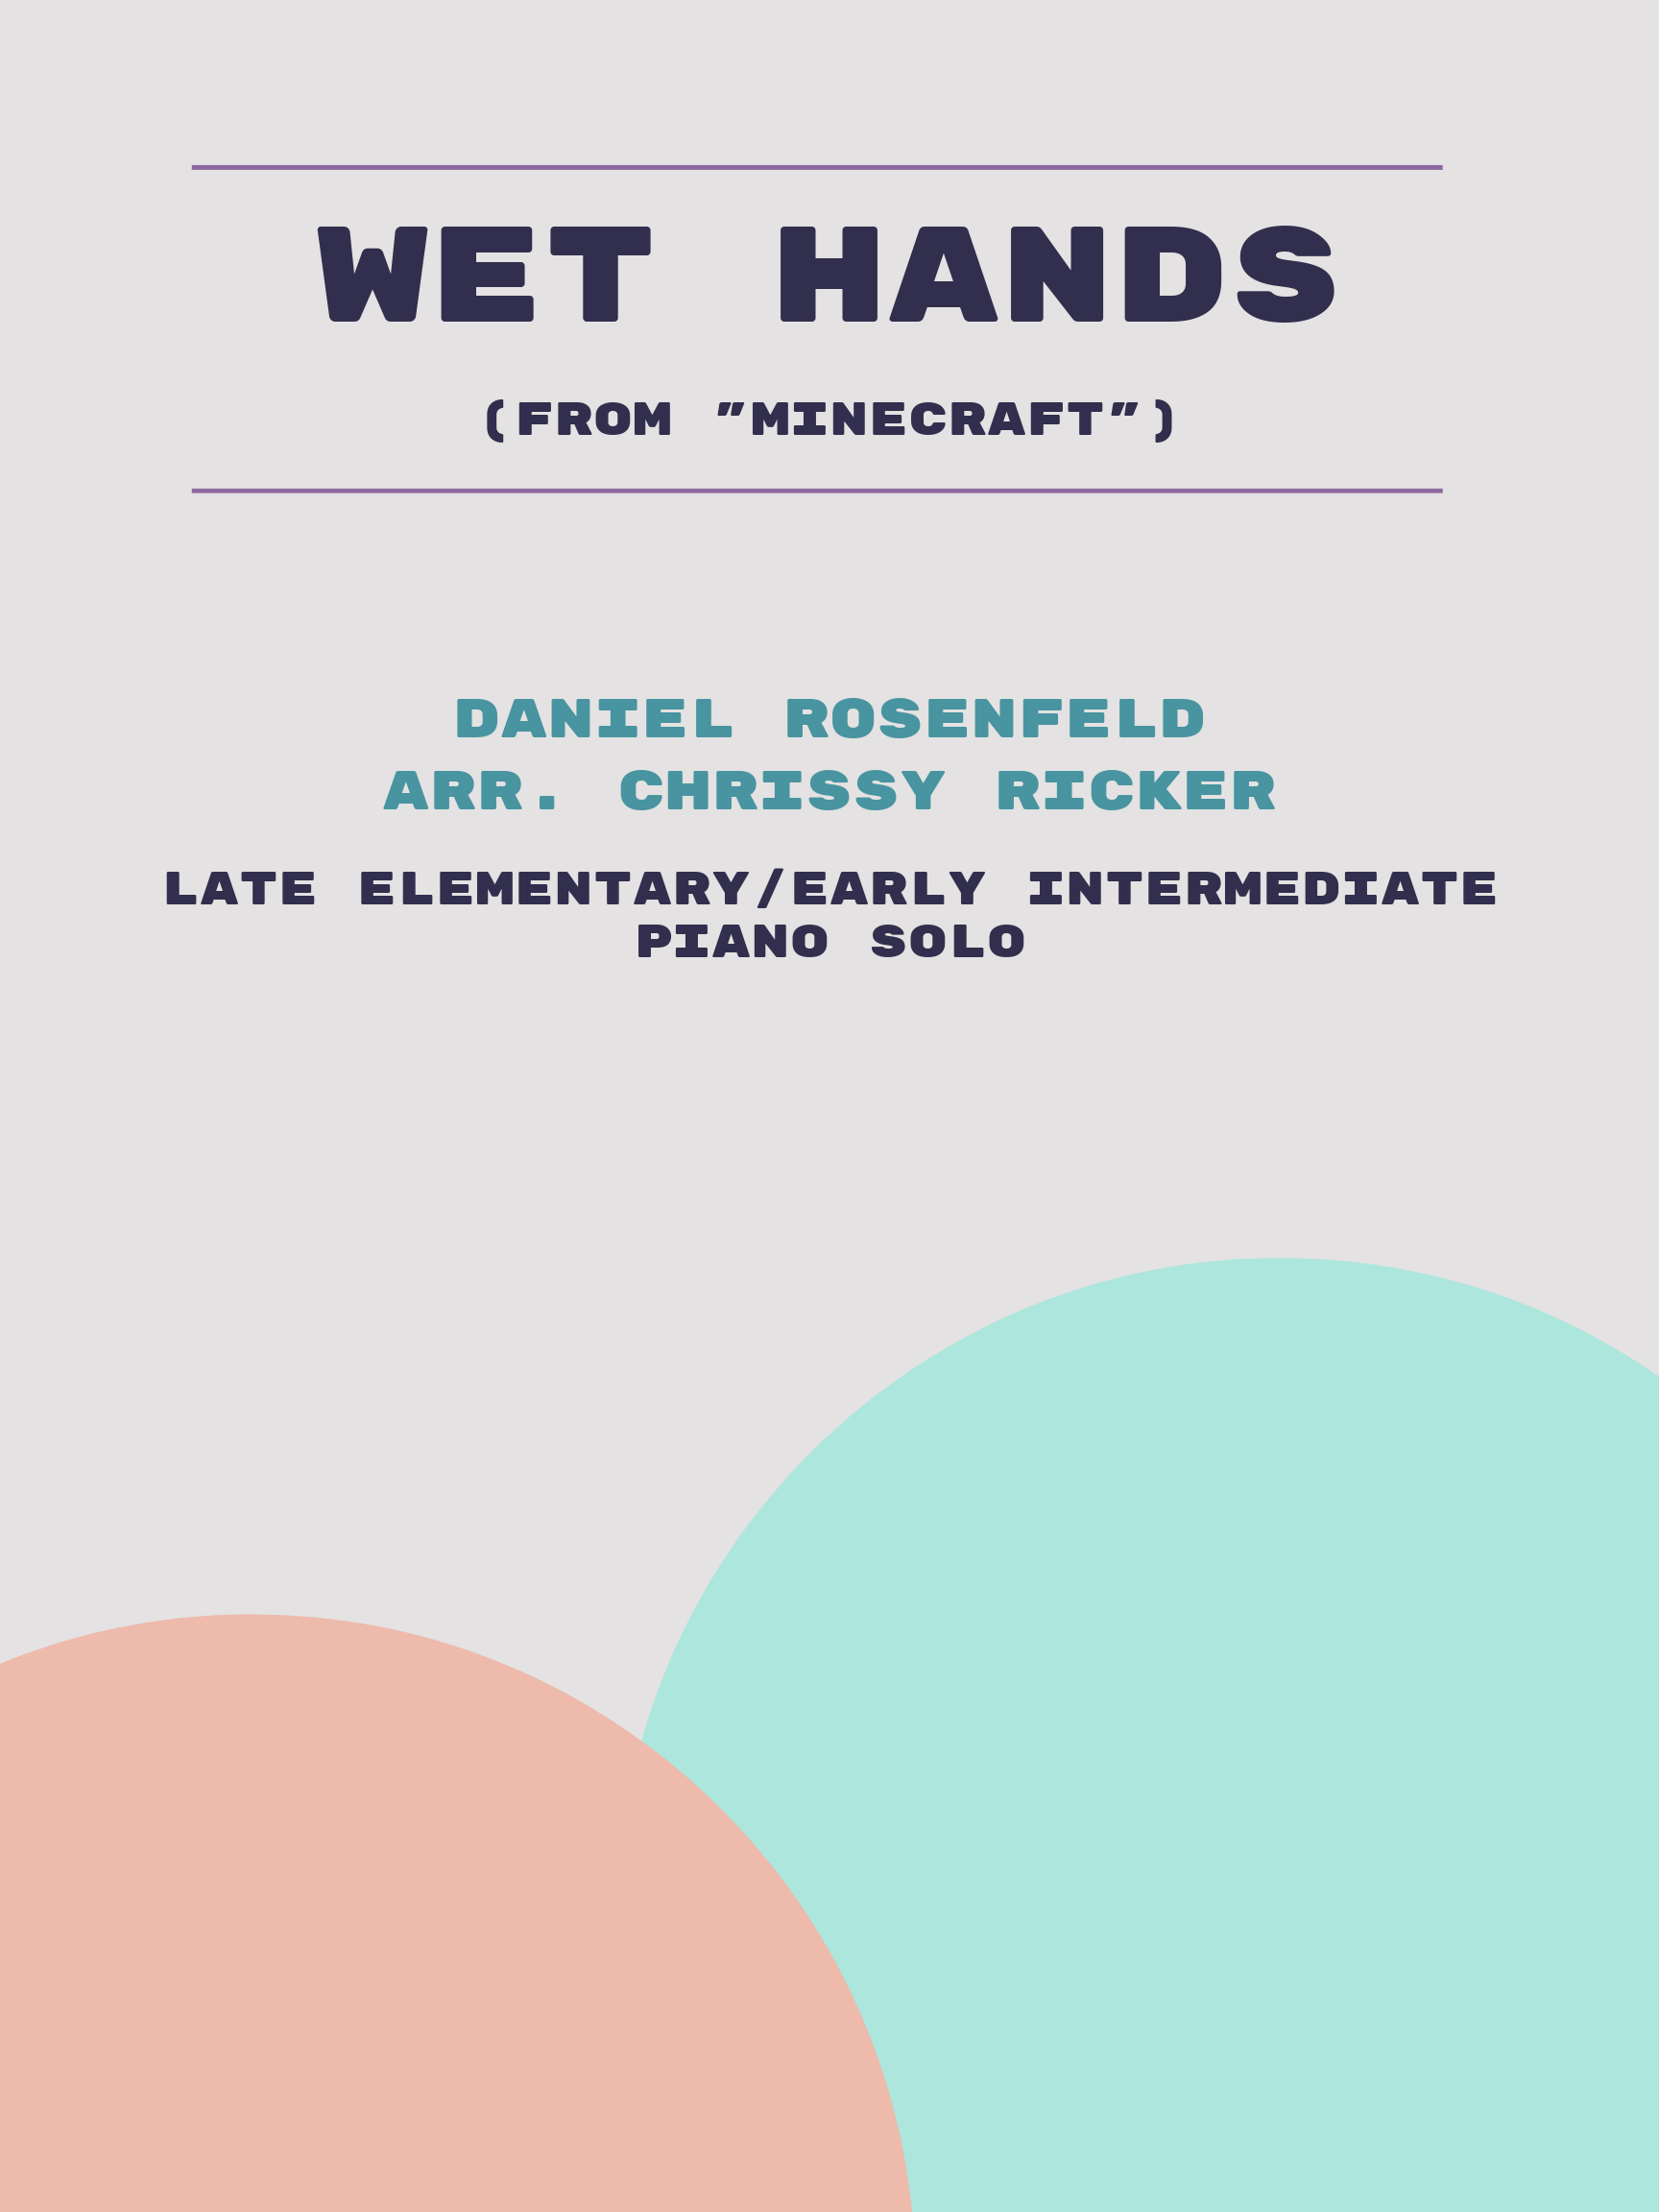 Wet Hands by Daniel Rosenfeld